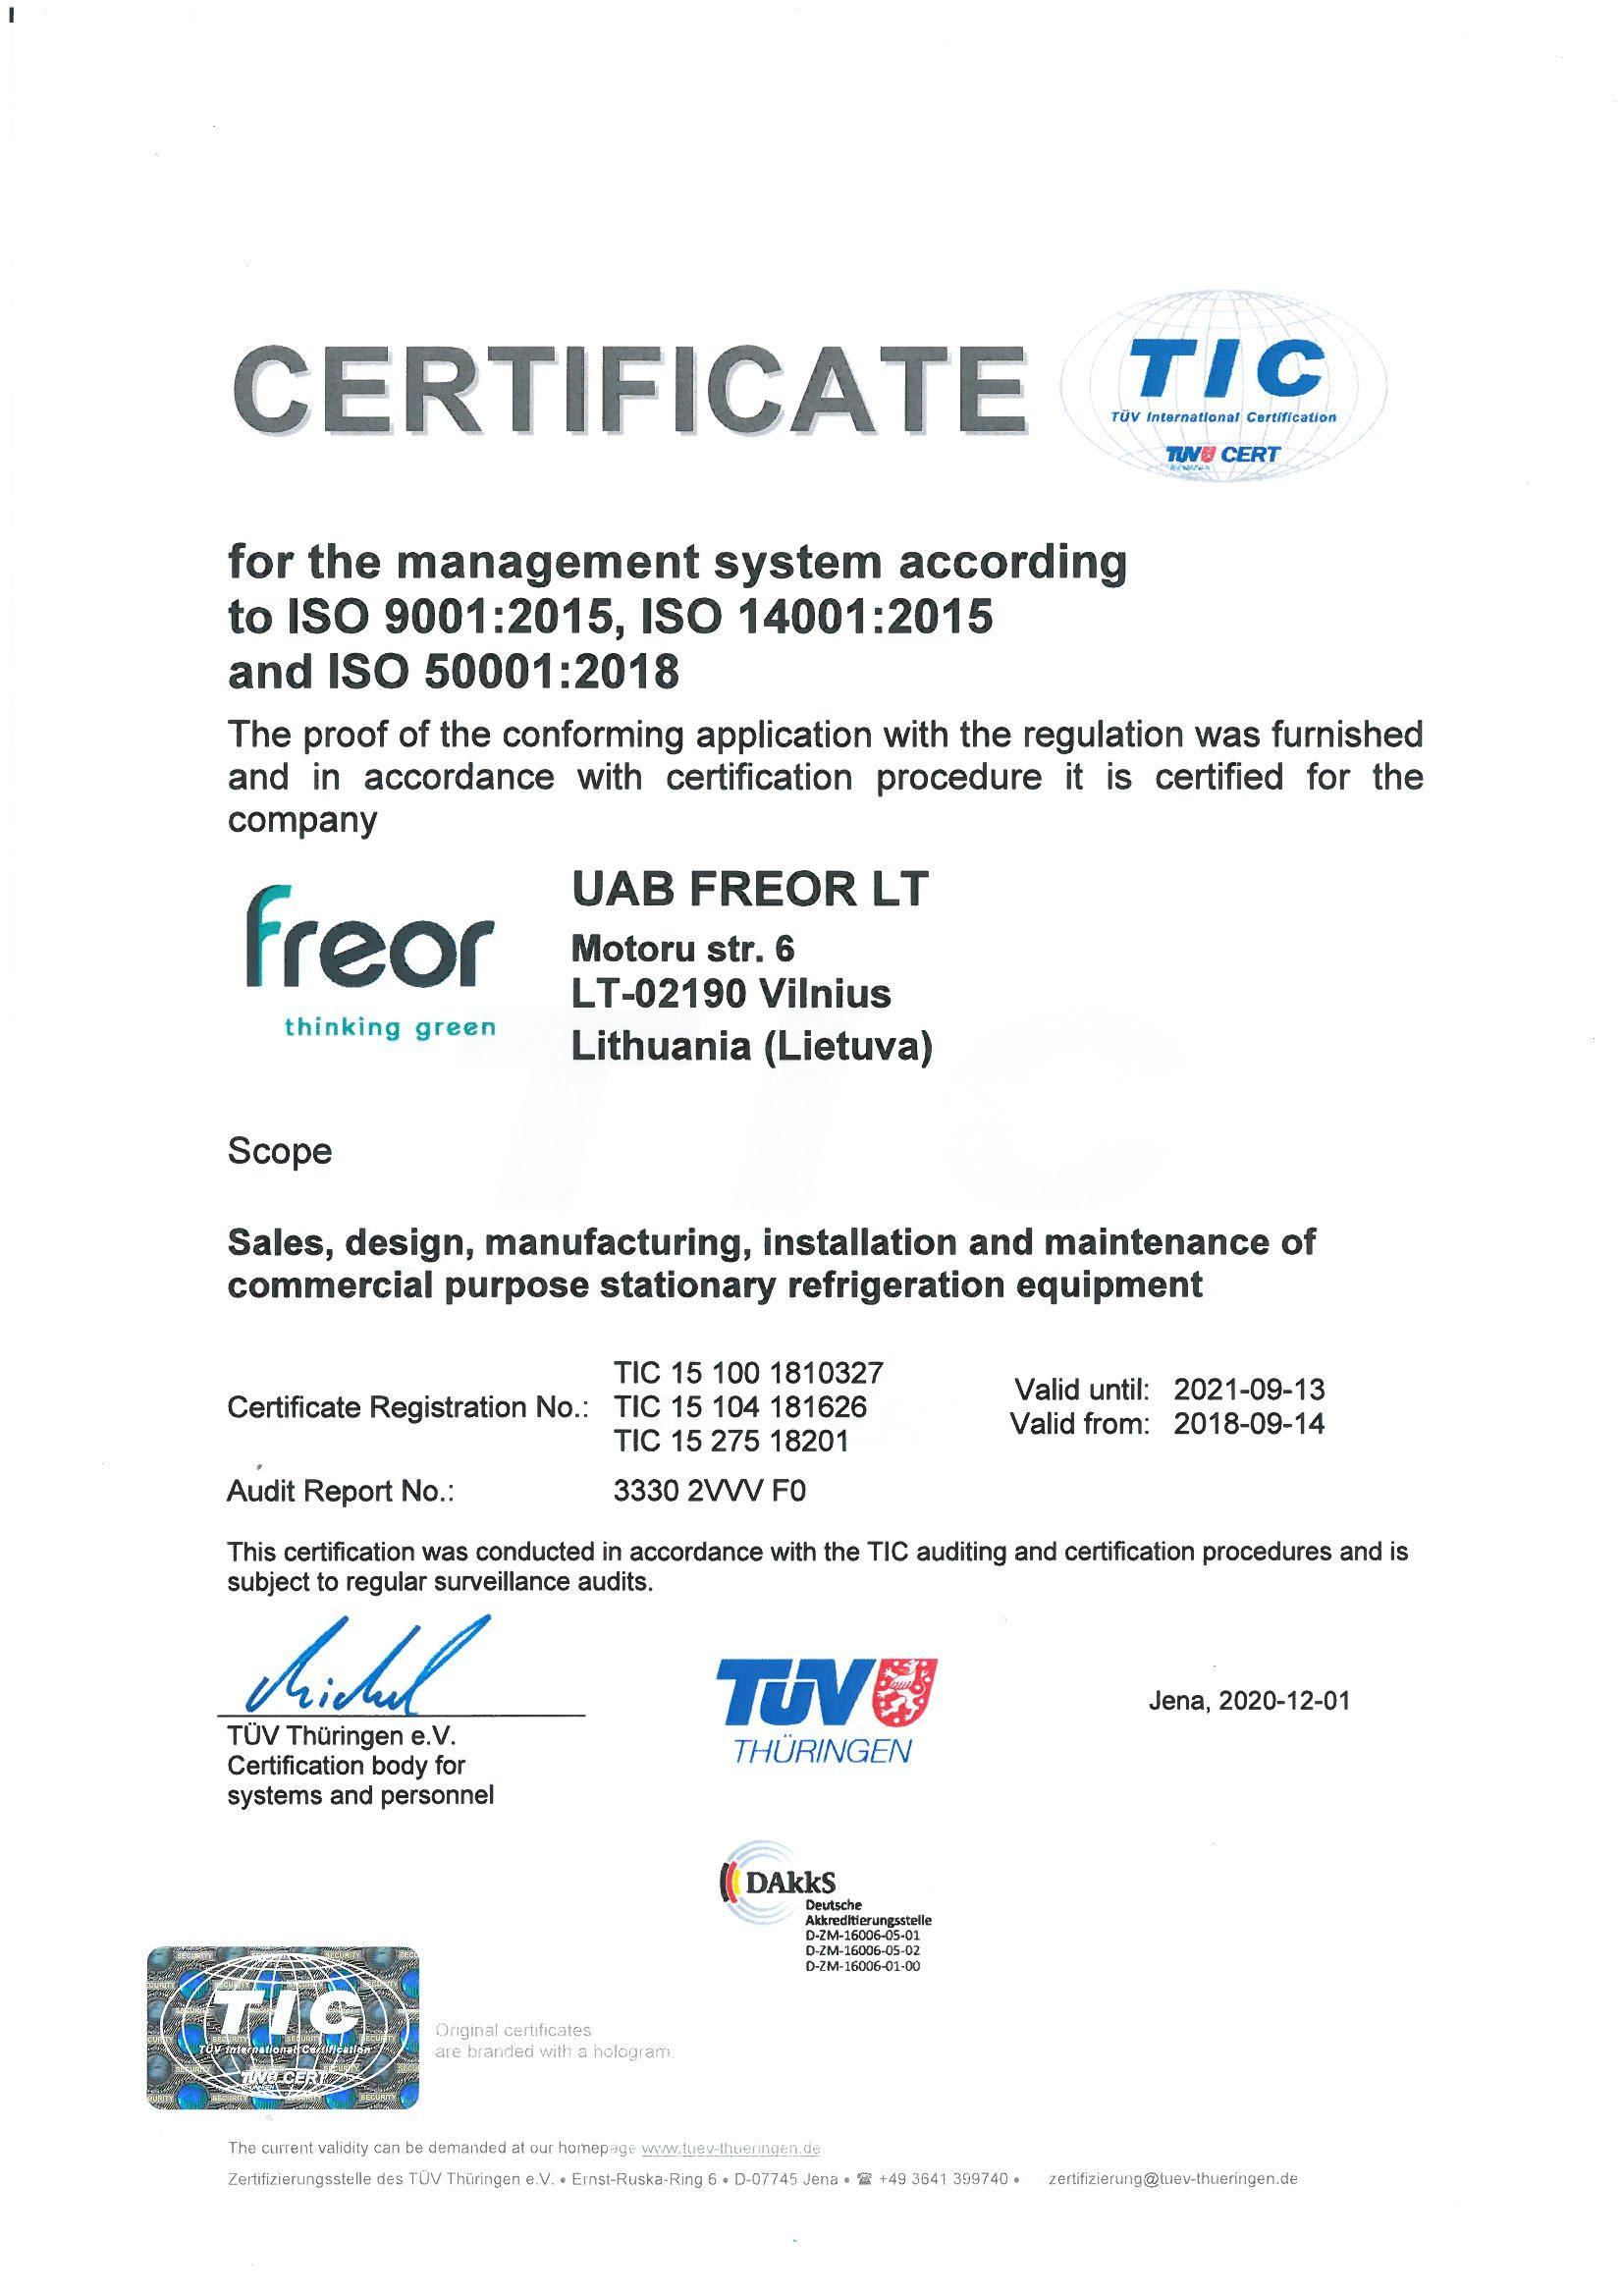 FREOR ISO certificate_TUV (1)